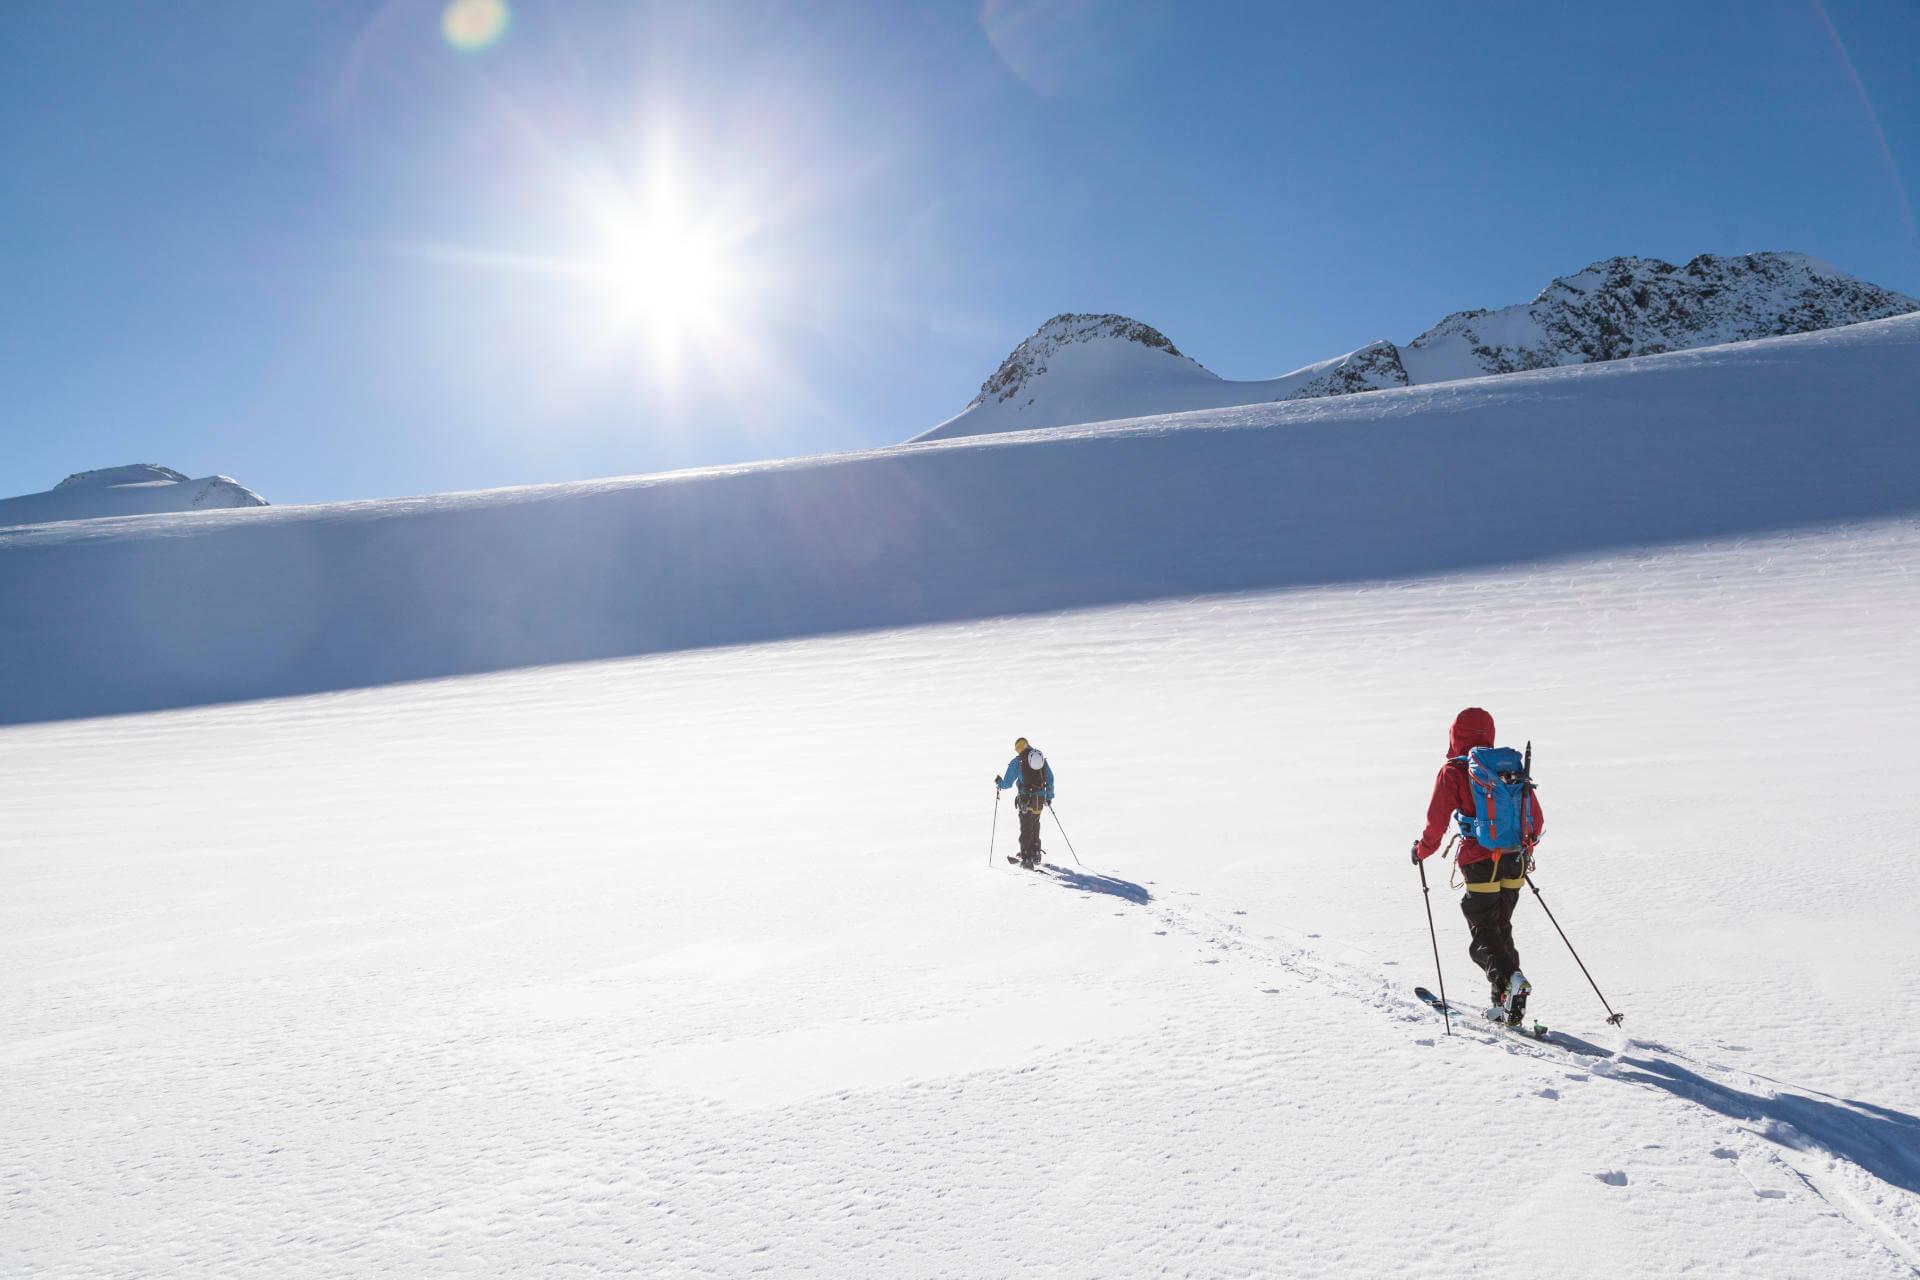 Ski Tour Bärenhorn - Two ski tourers on their way up.